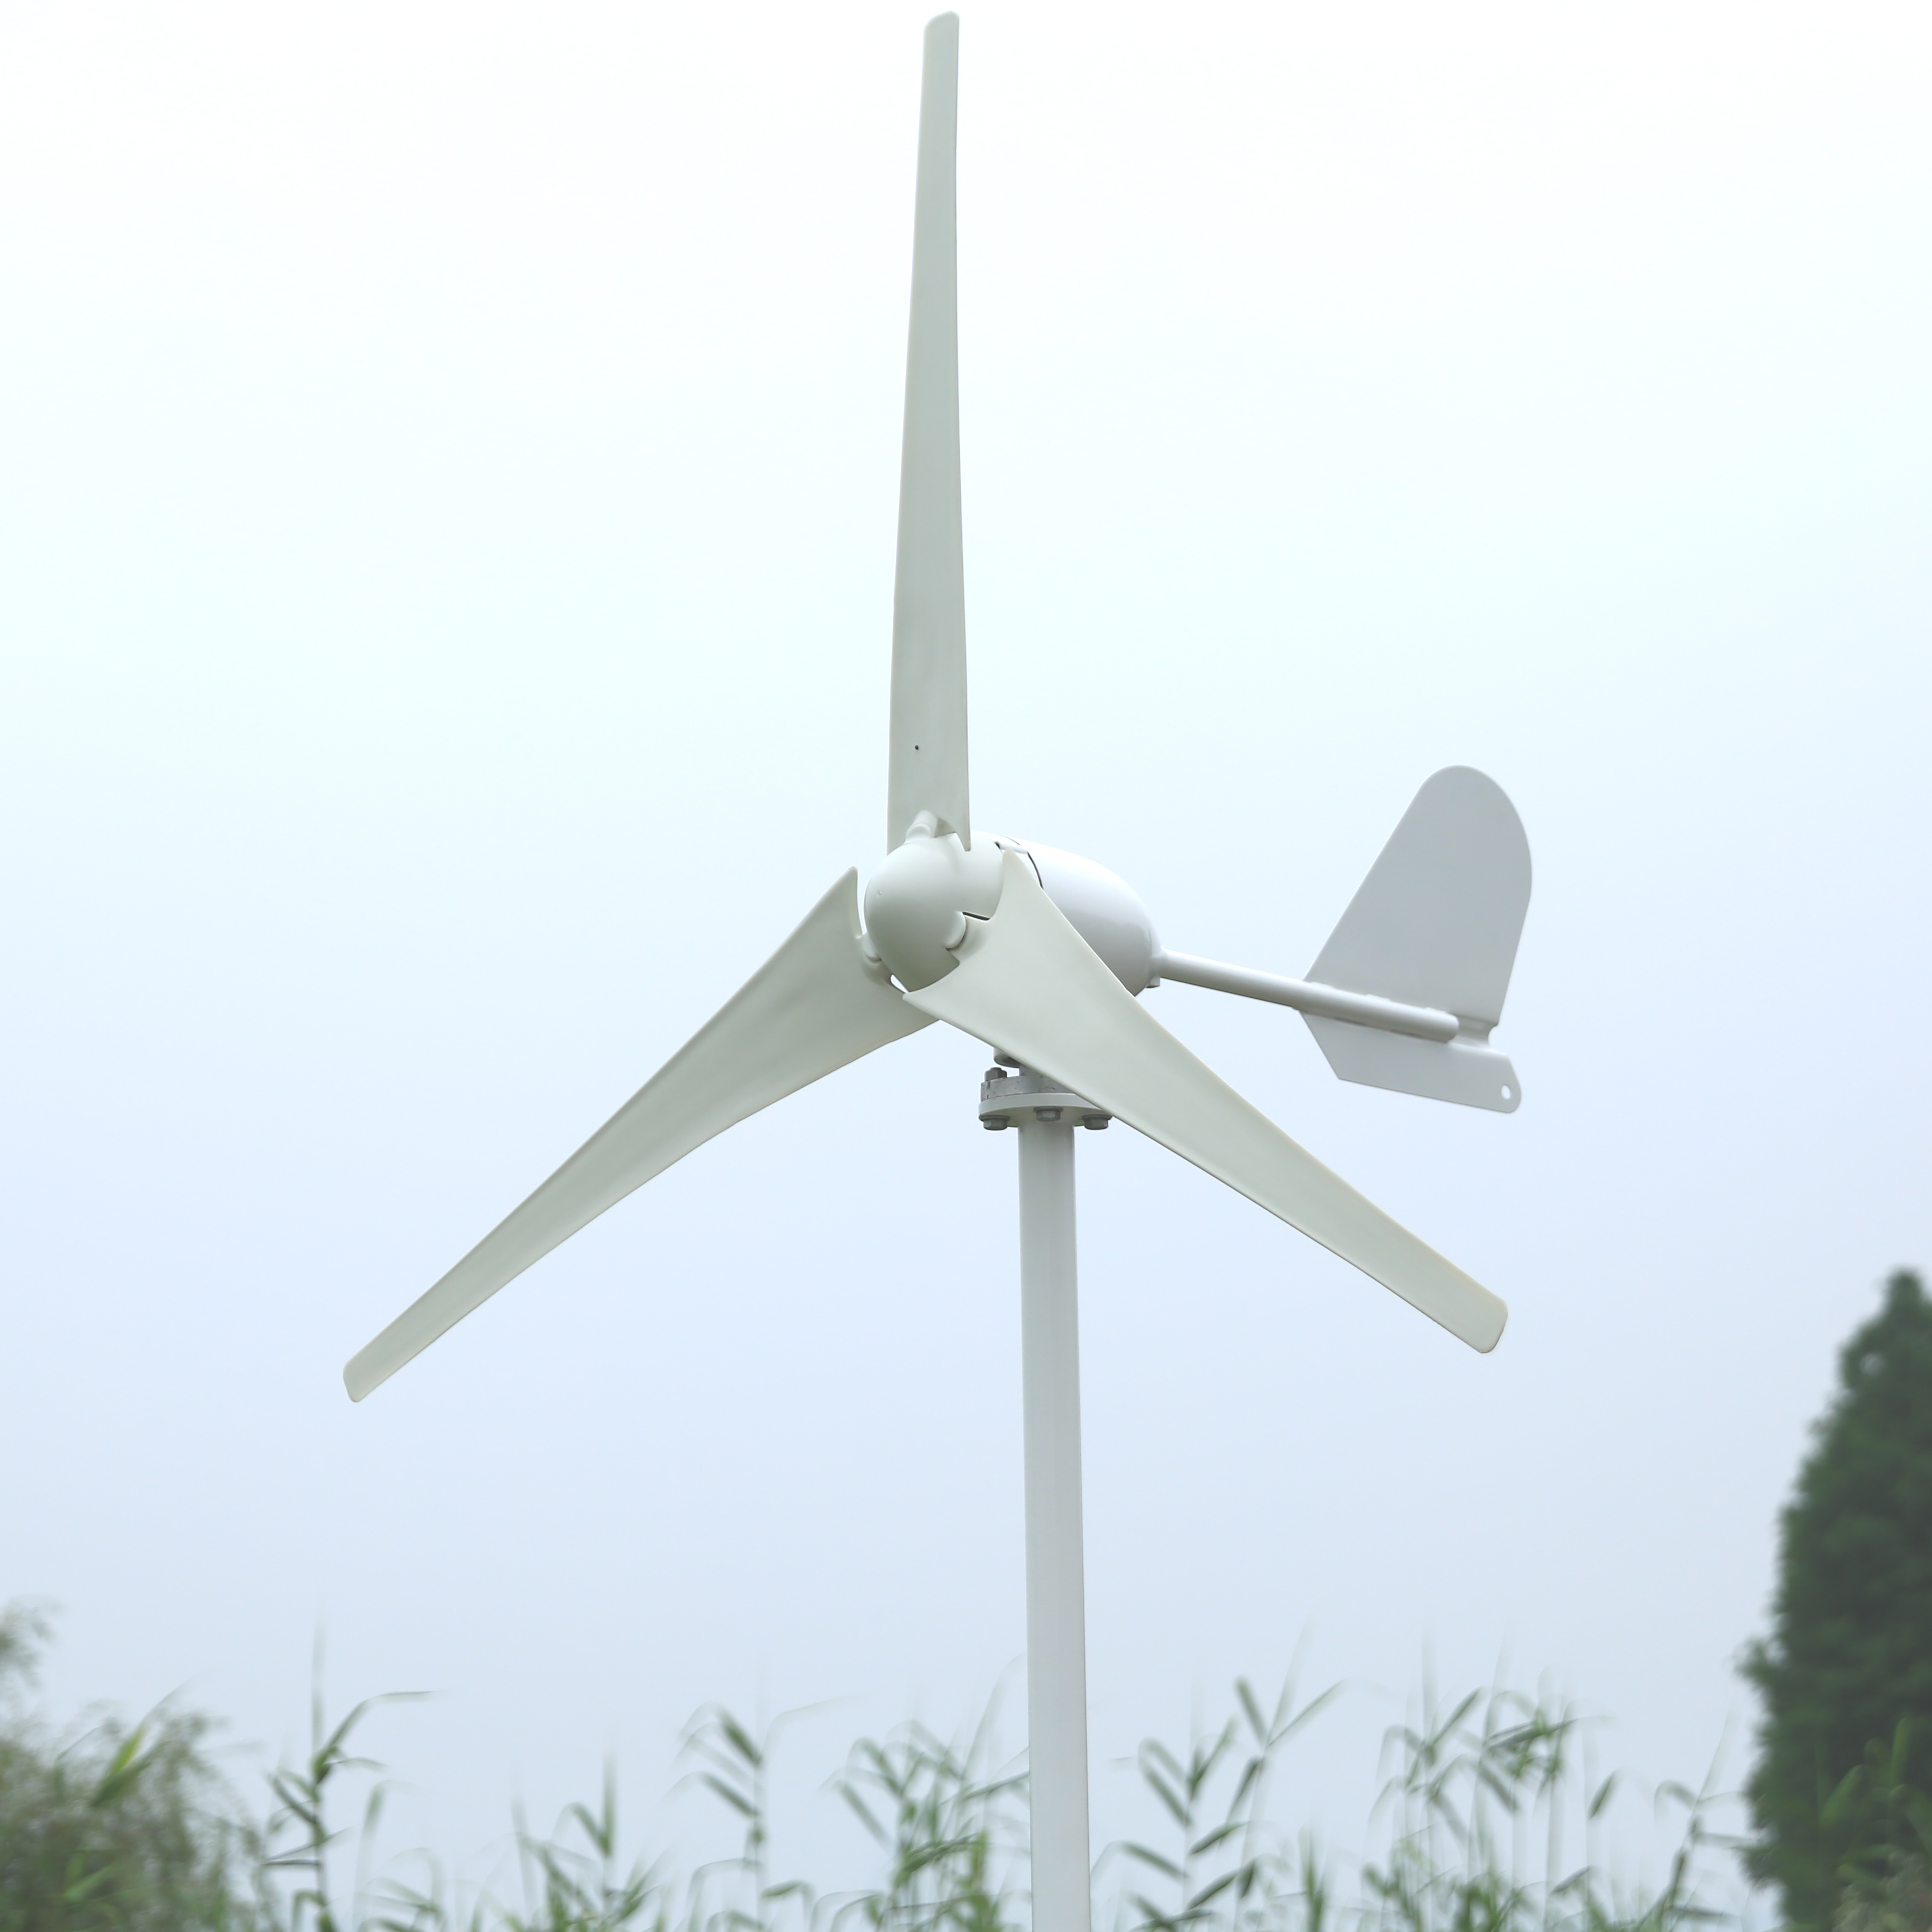 High-Efficiency 500W Horizontal Axis AC Wind Turbine 12V Or 24V For Boat